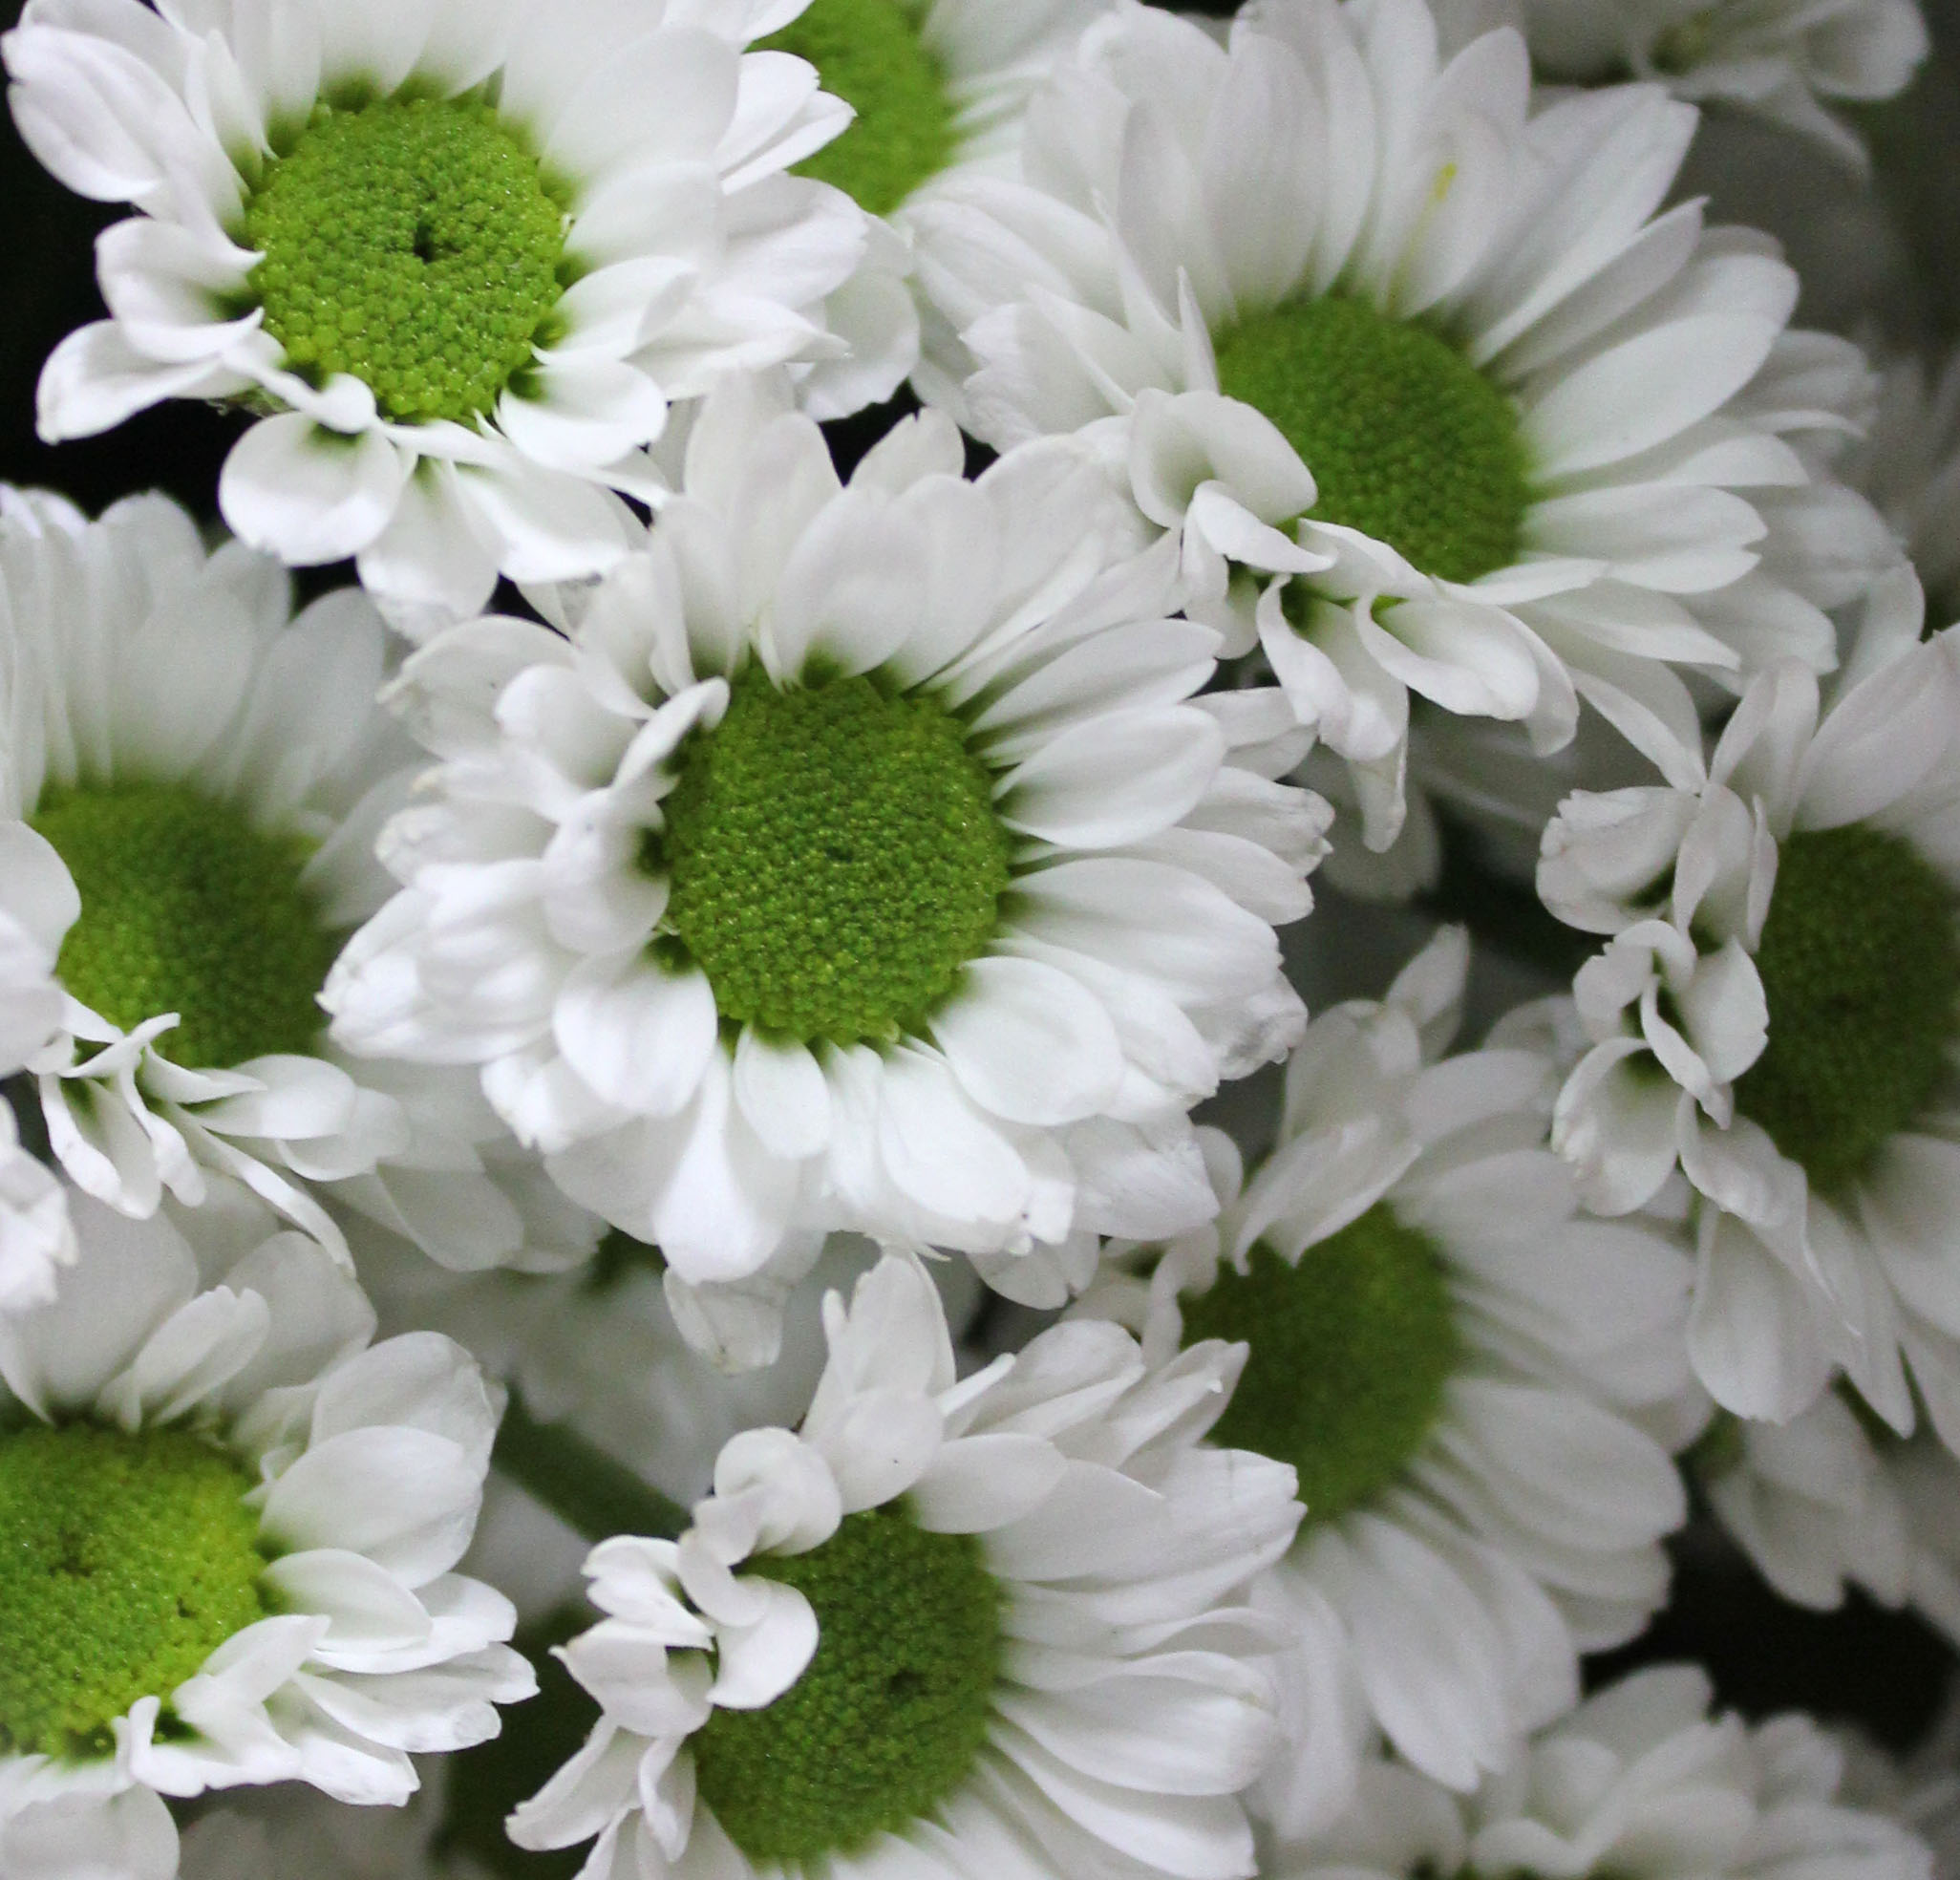 Pom poms spray mums stevens and son wholesale florist white green centre mightylinksfo